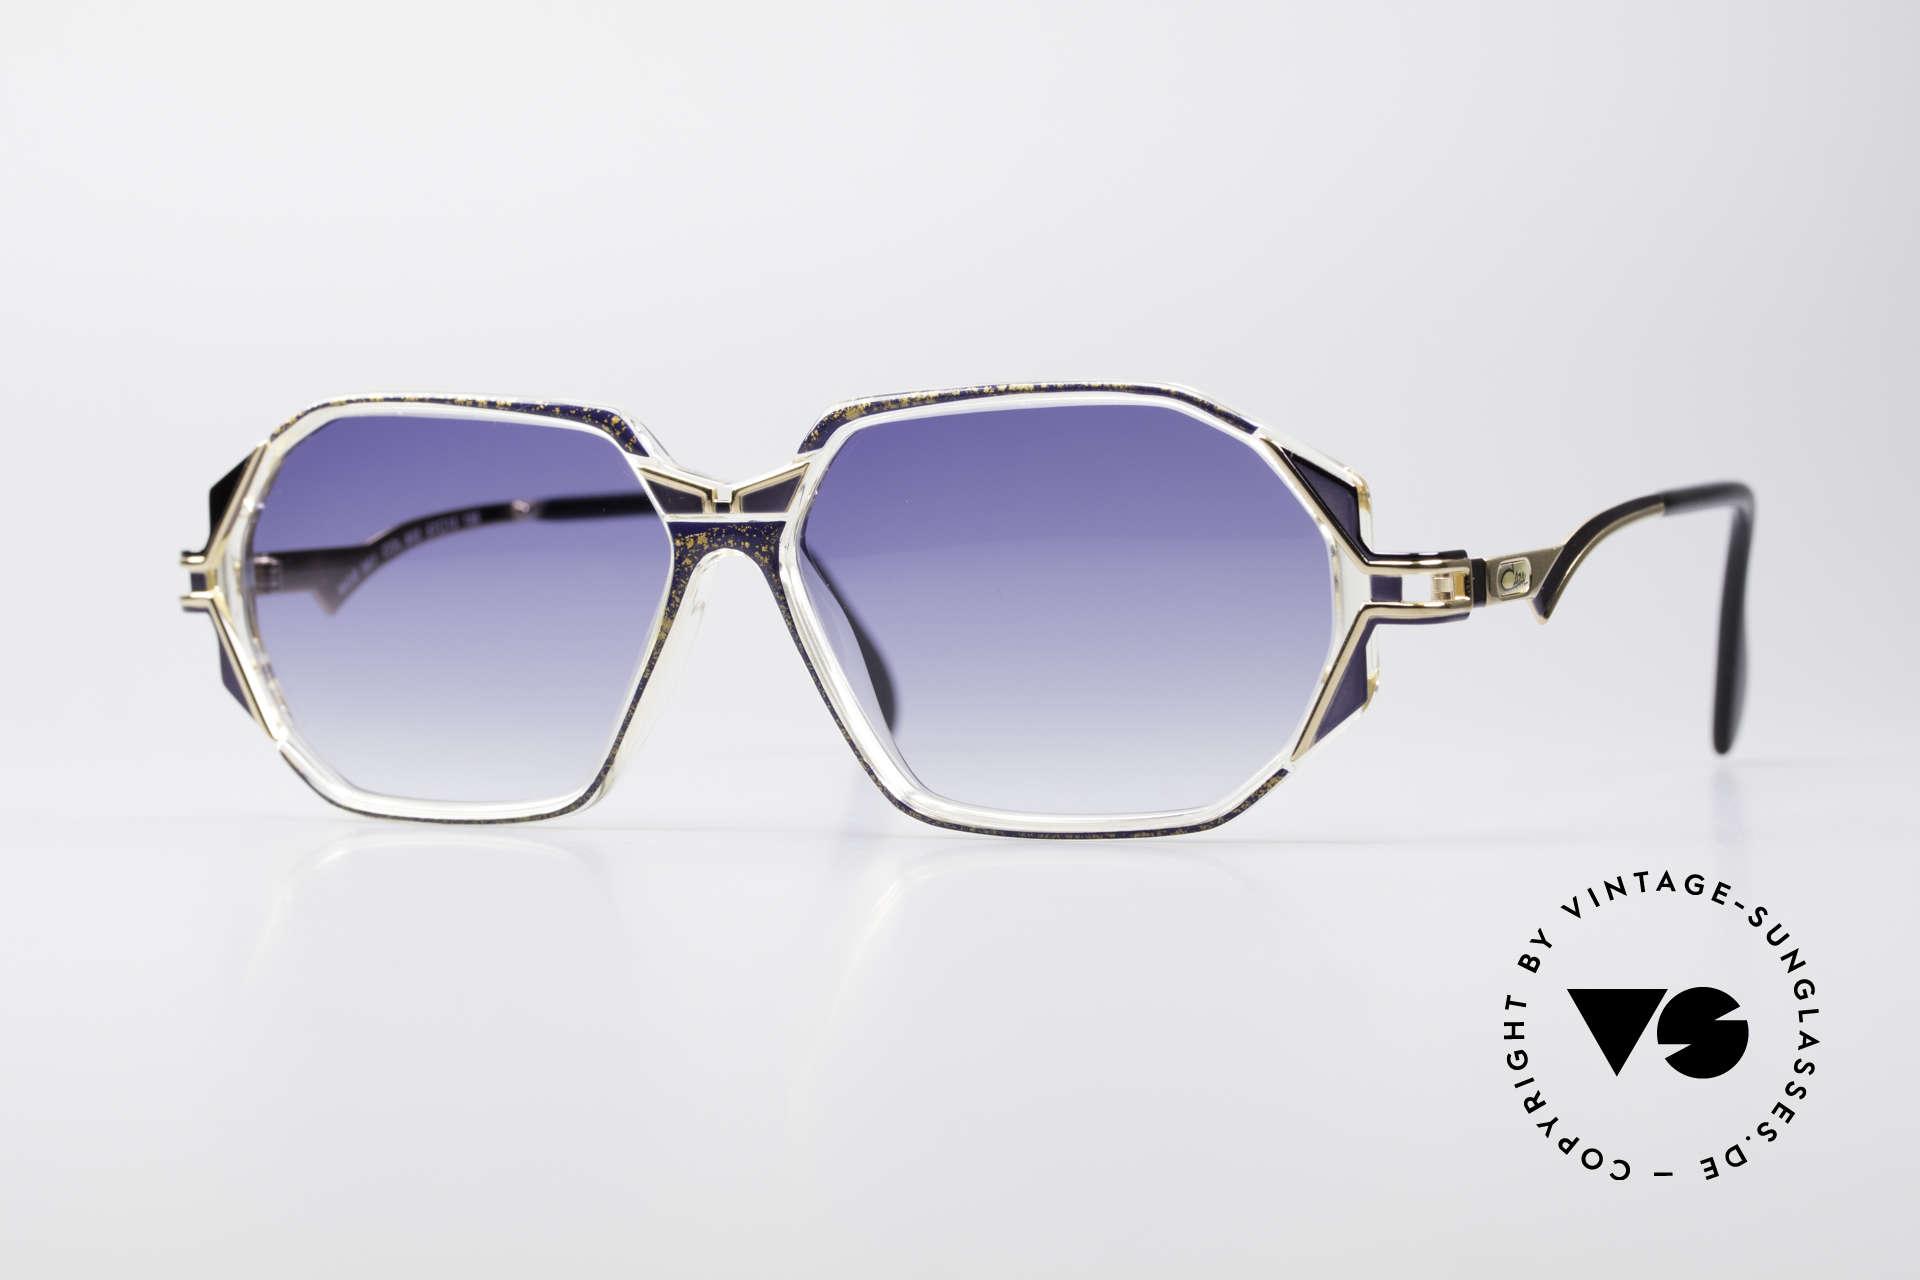 Cazal 361 Designer Sunglasses No Retro, adorned CAZAL sunglasses from the early / mid 1990's, Made for Women